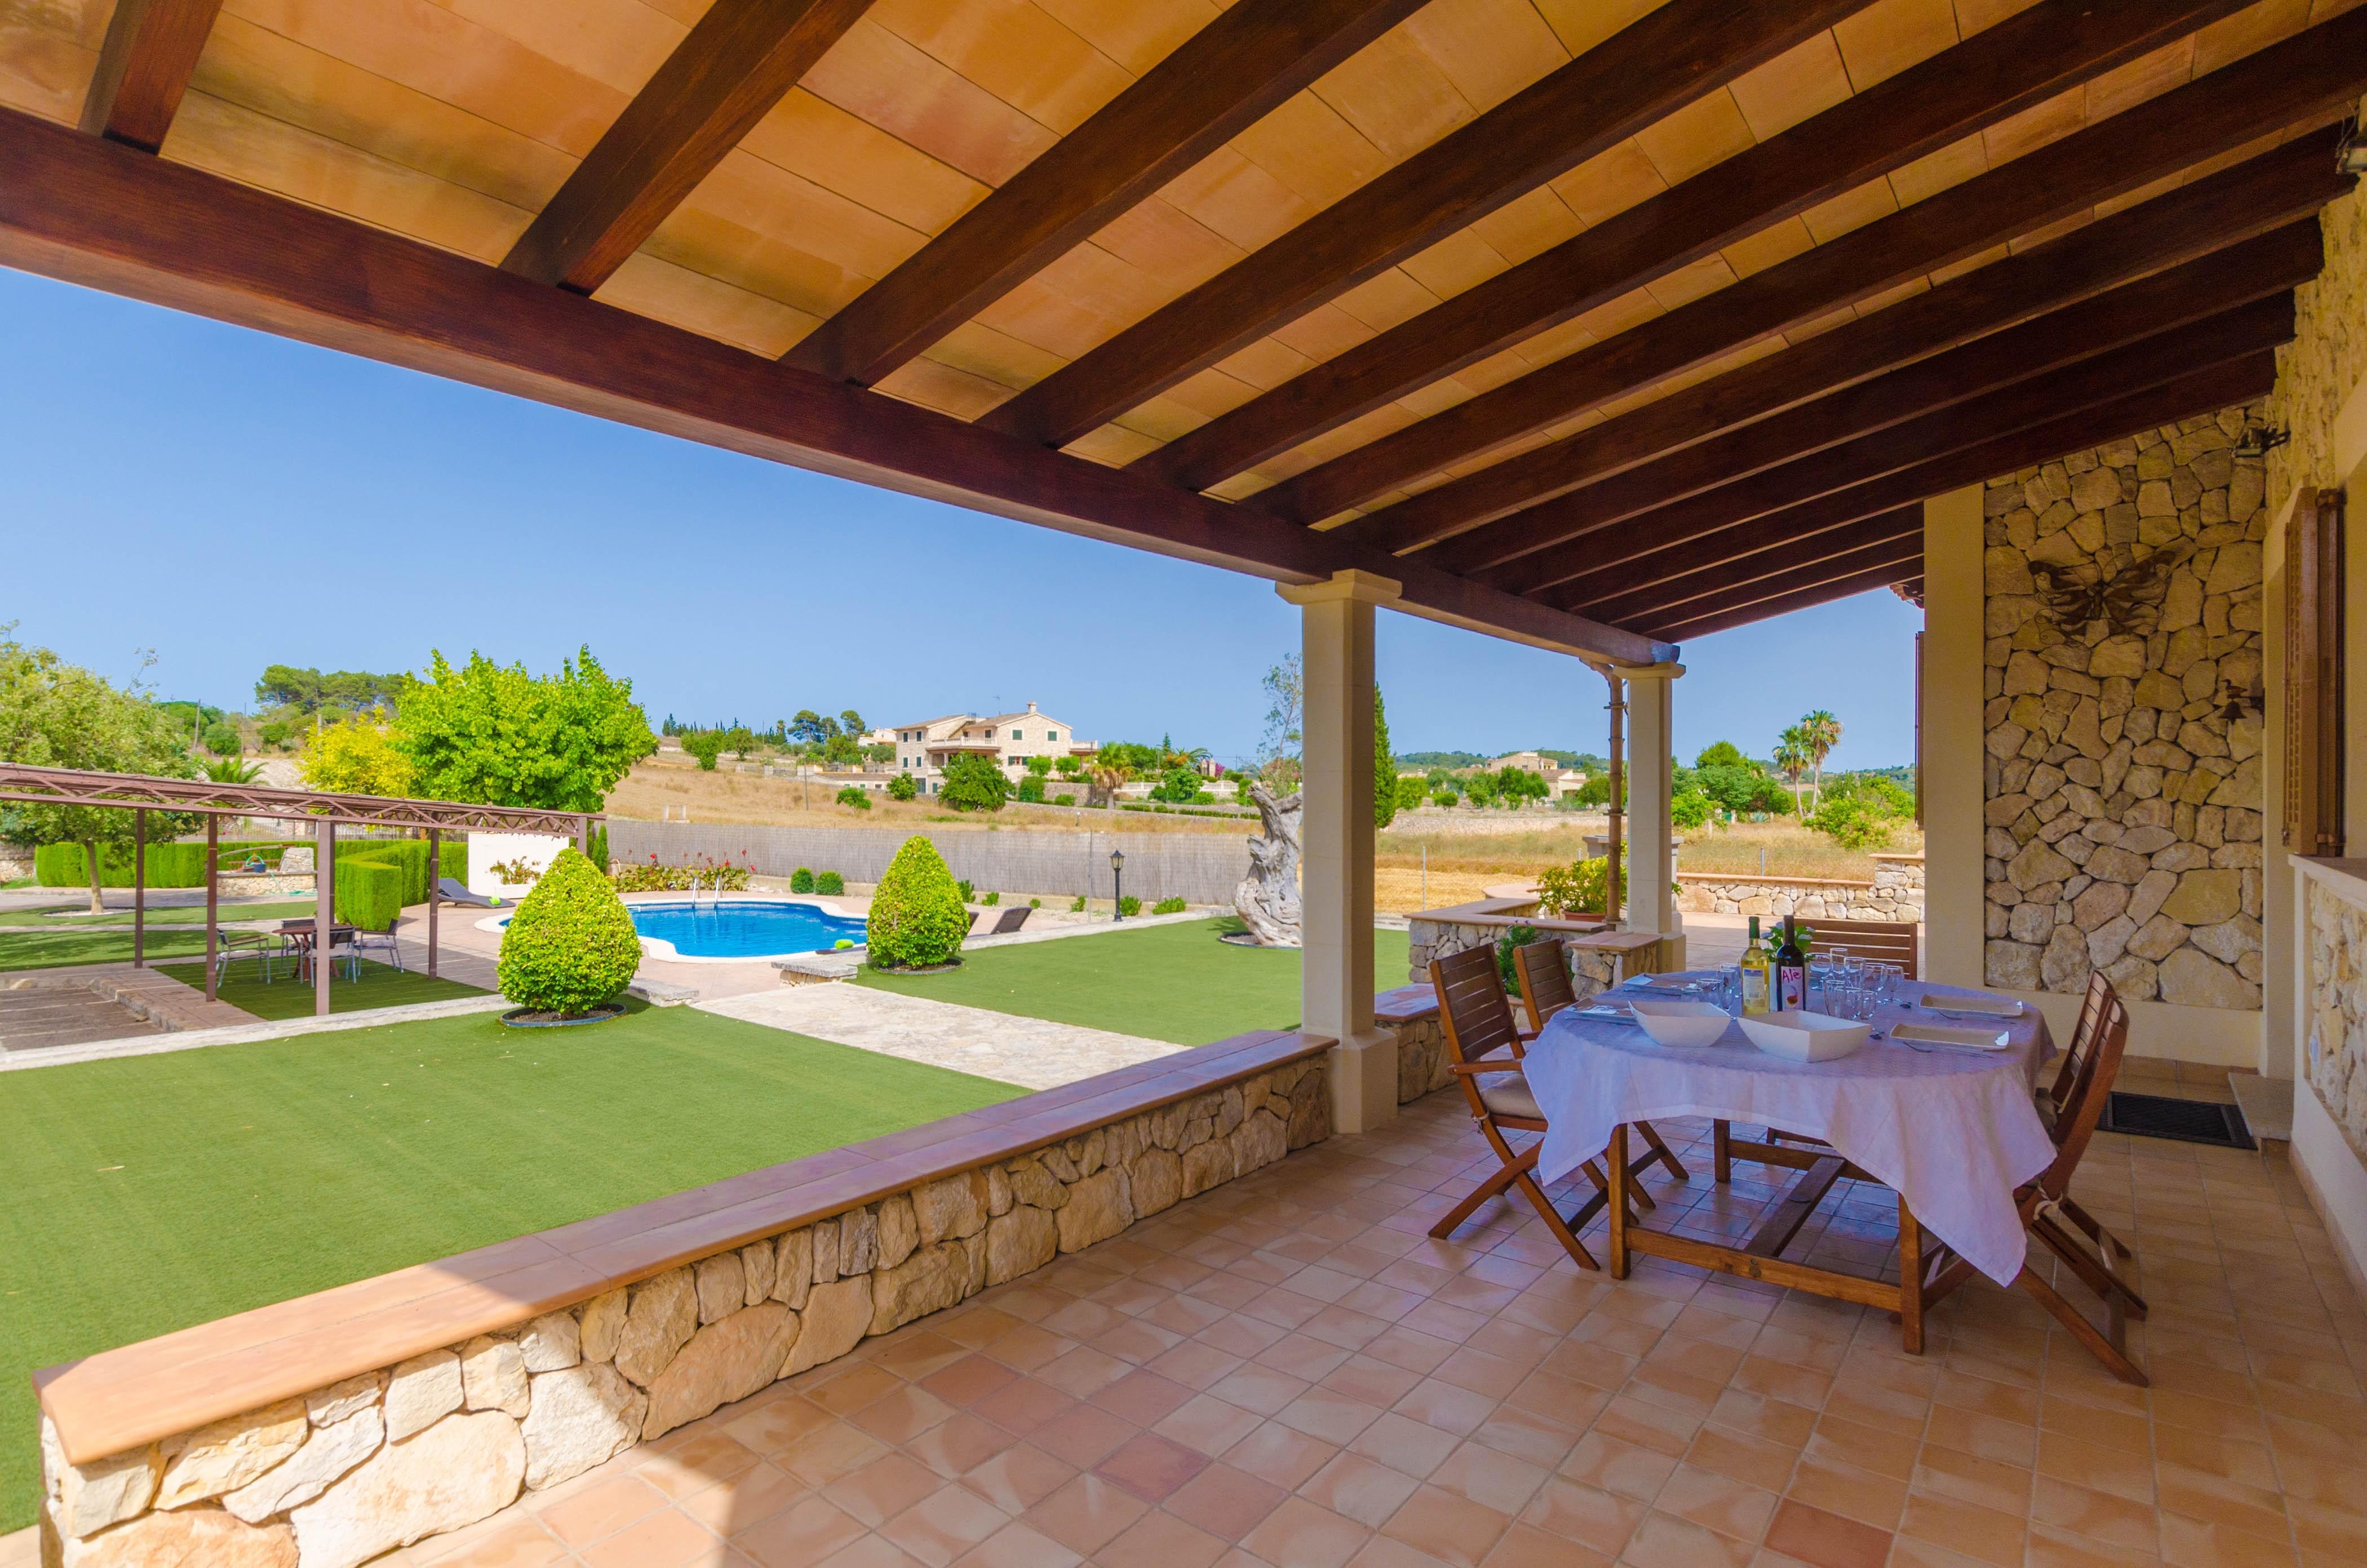 Maison de vacances SA SINIA (2374876), Lloret de Vistalegre, Majorque, Iles Baléares, Espagne, image 52